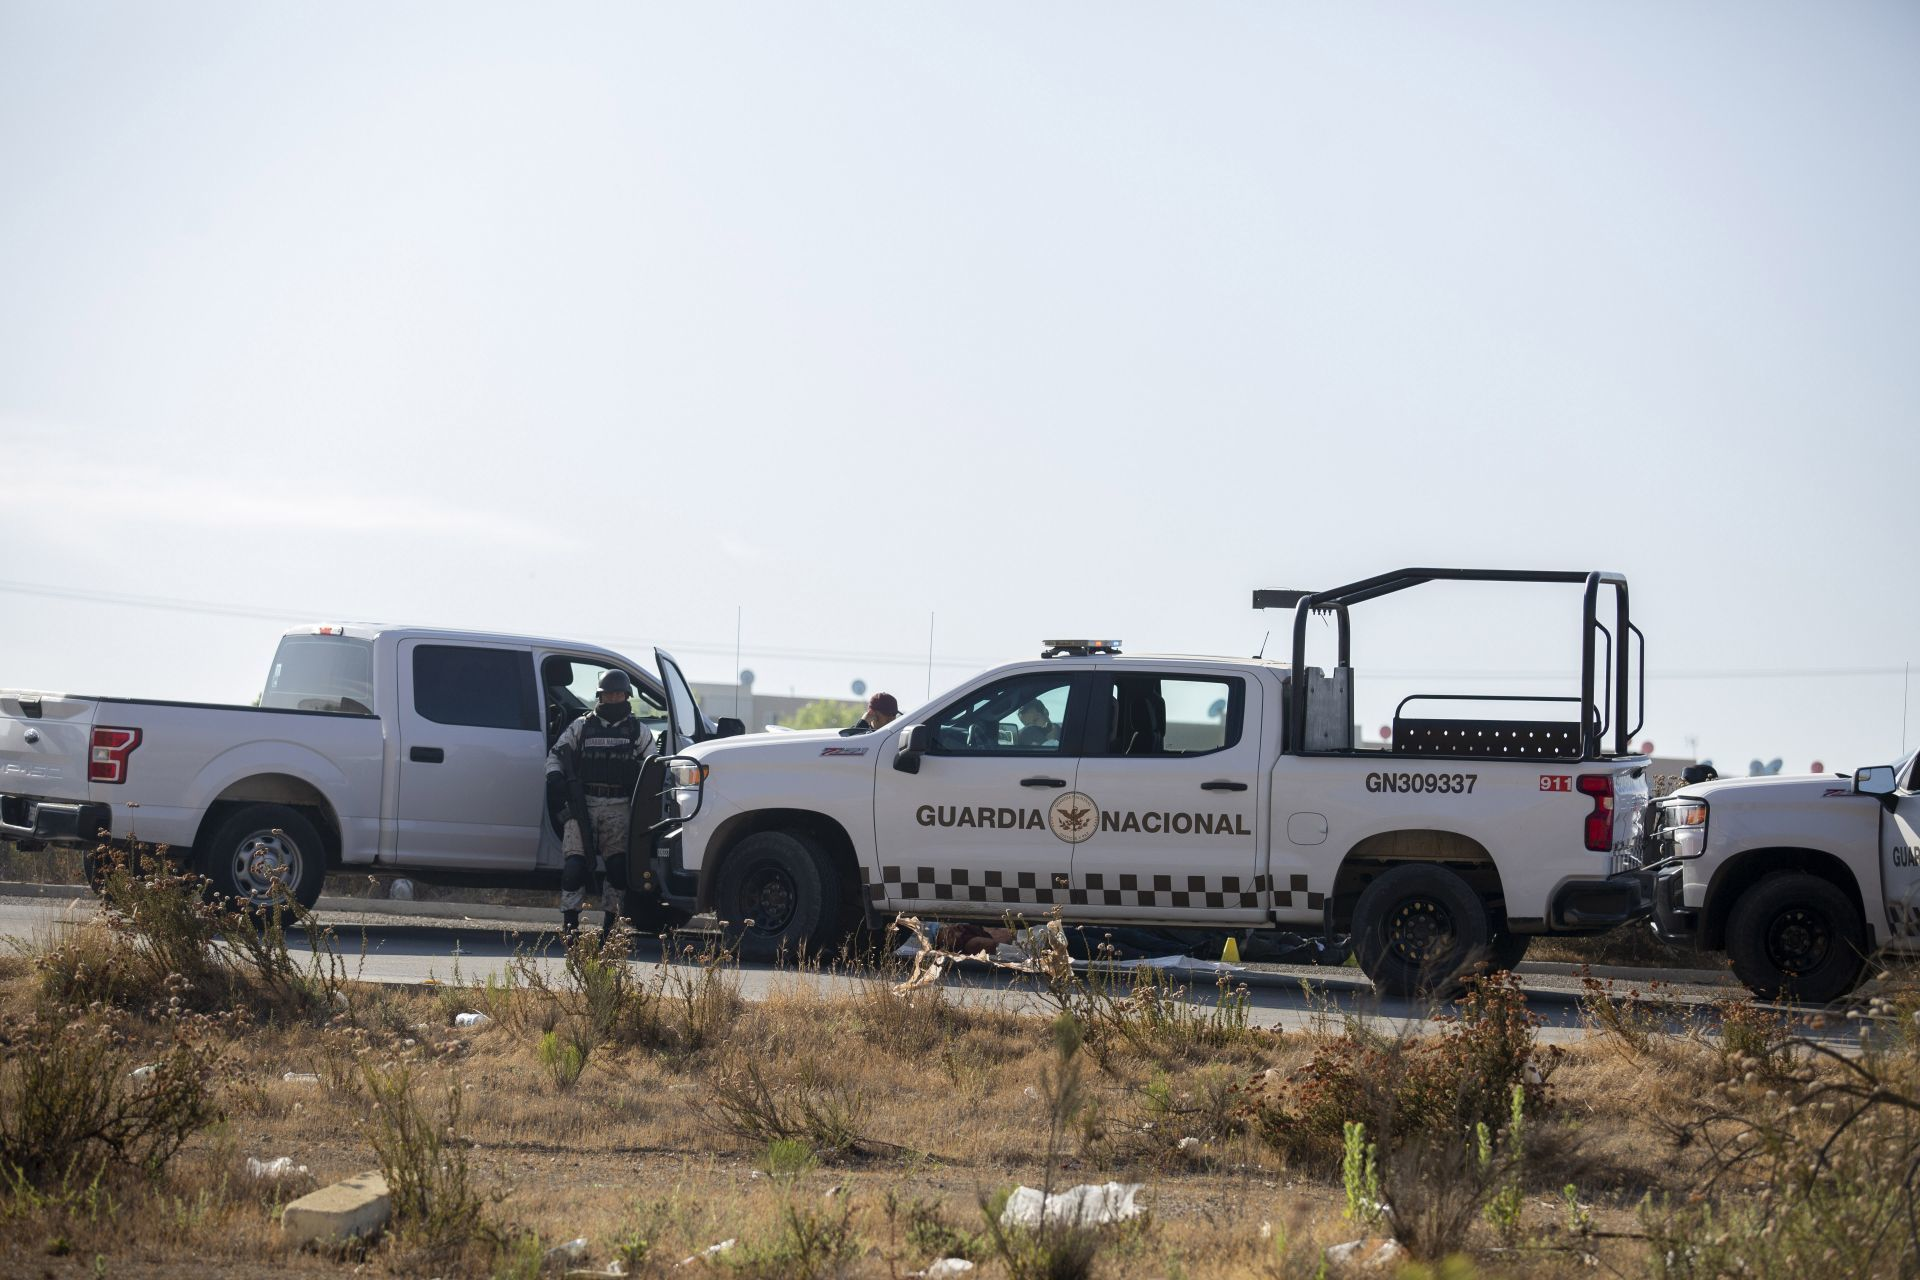 Tijuana escena de crimen ilustrativas (Foto: Cuartoscuro)